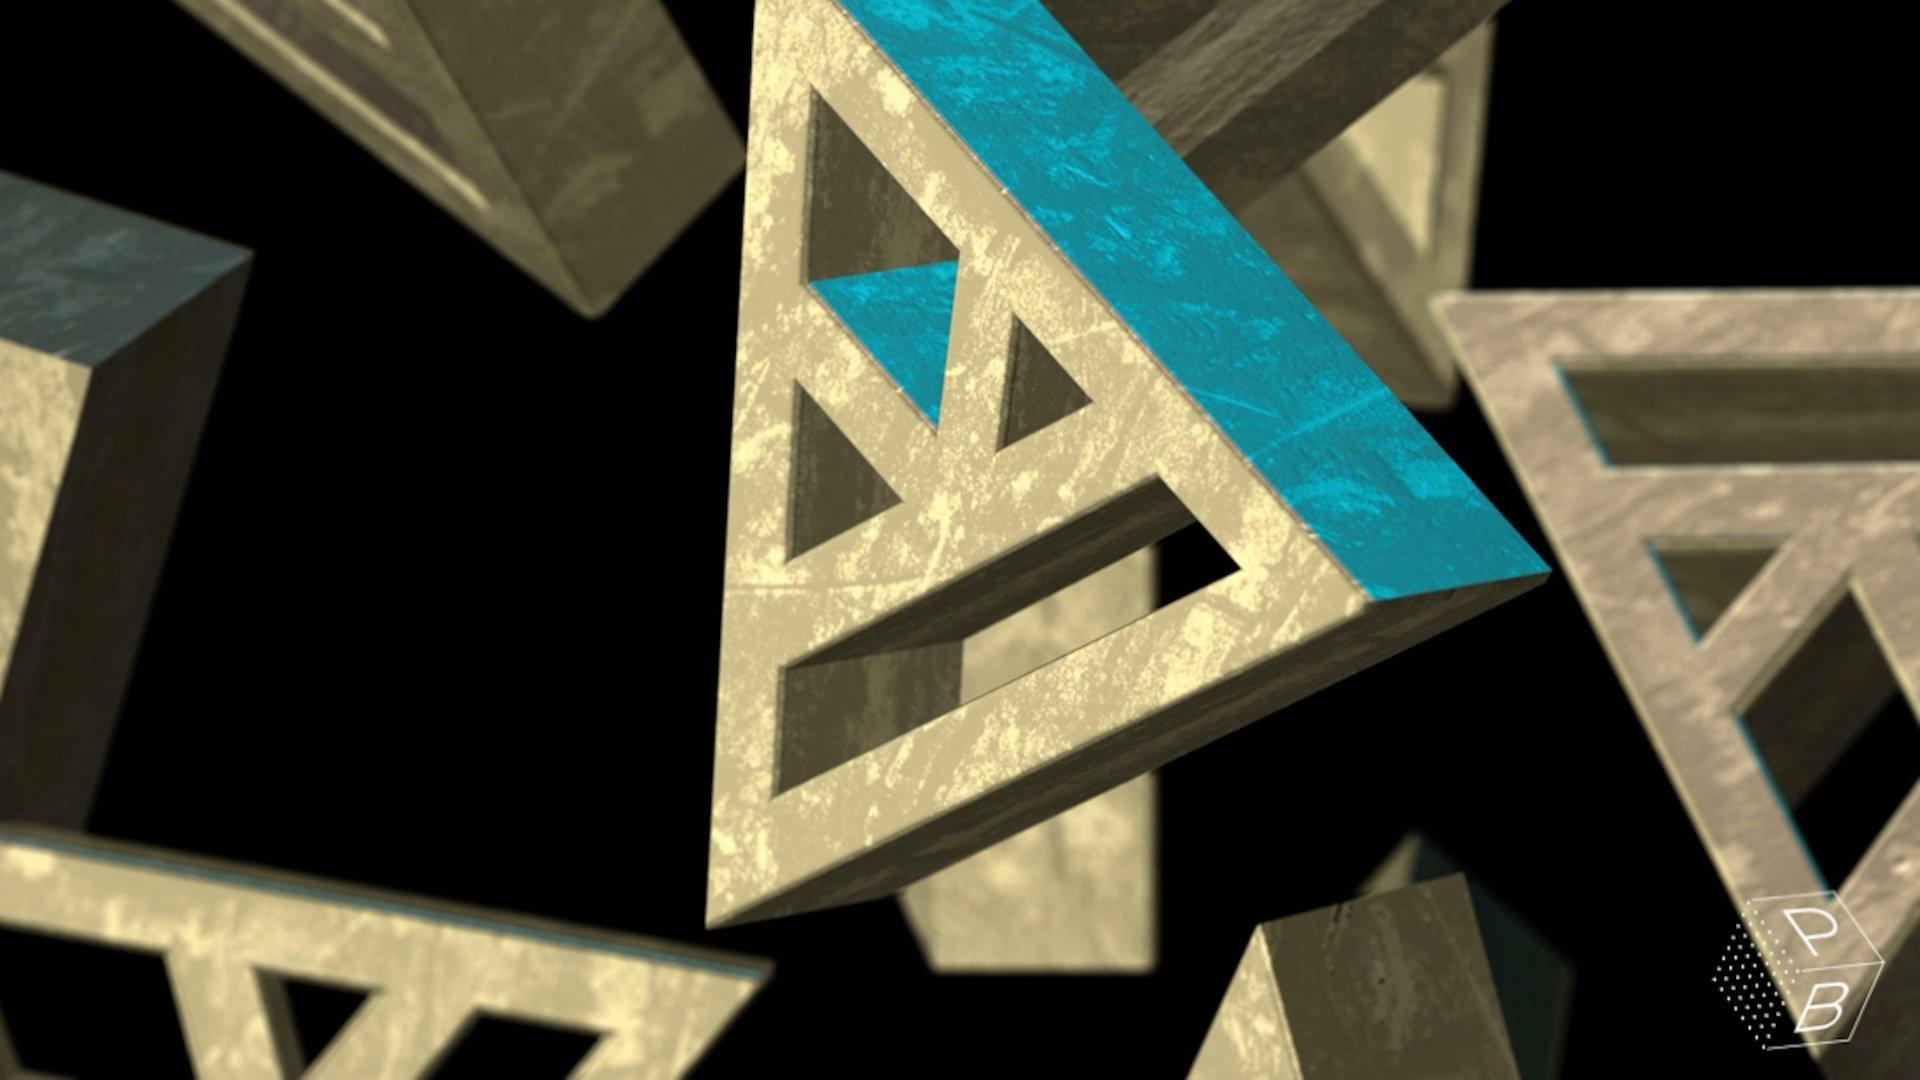 5_Pixel_Startseite_Klingande